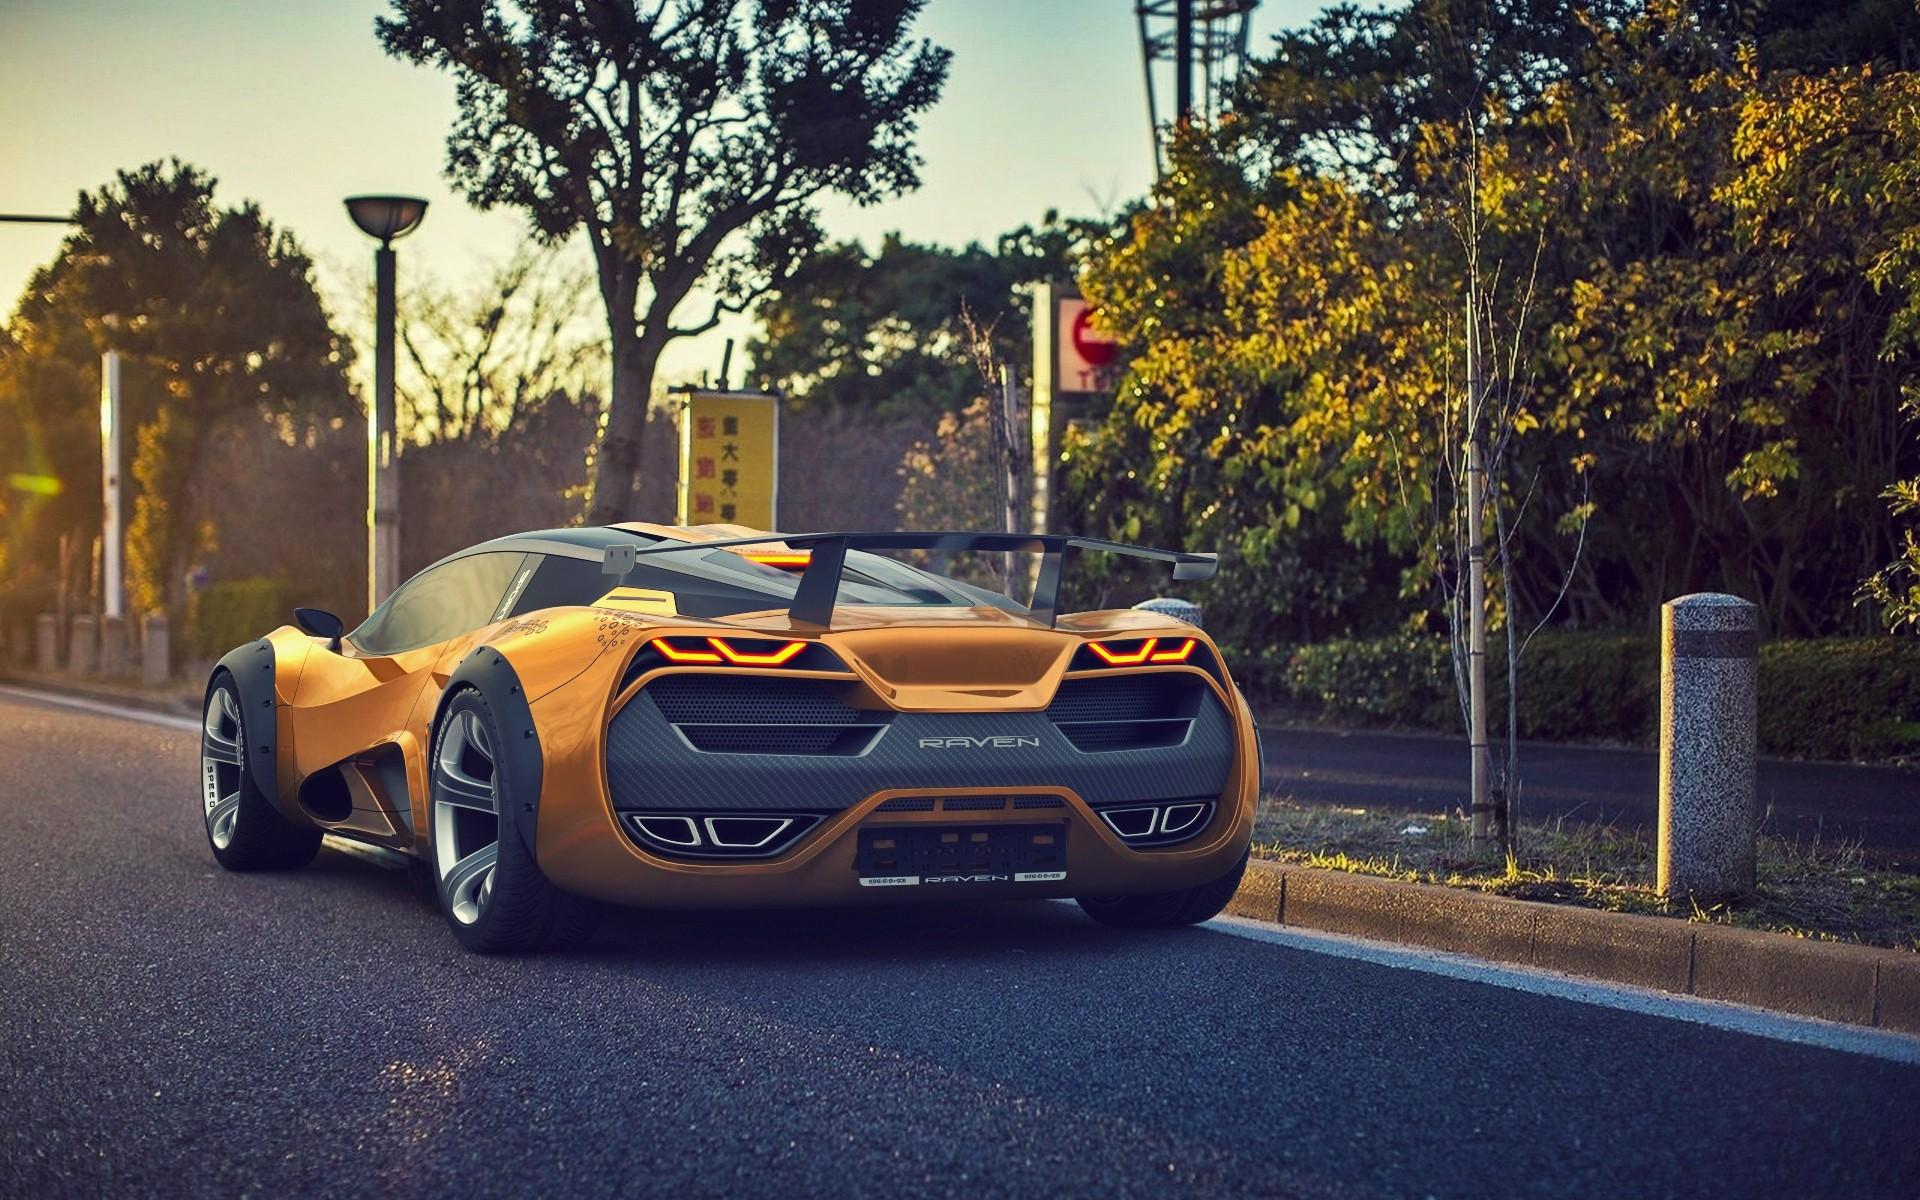 Wallpaper Road Lamborghini Aventador Sports Car Performance Car